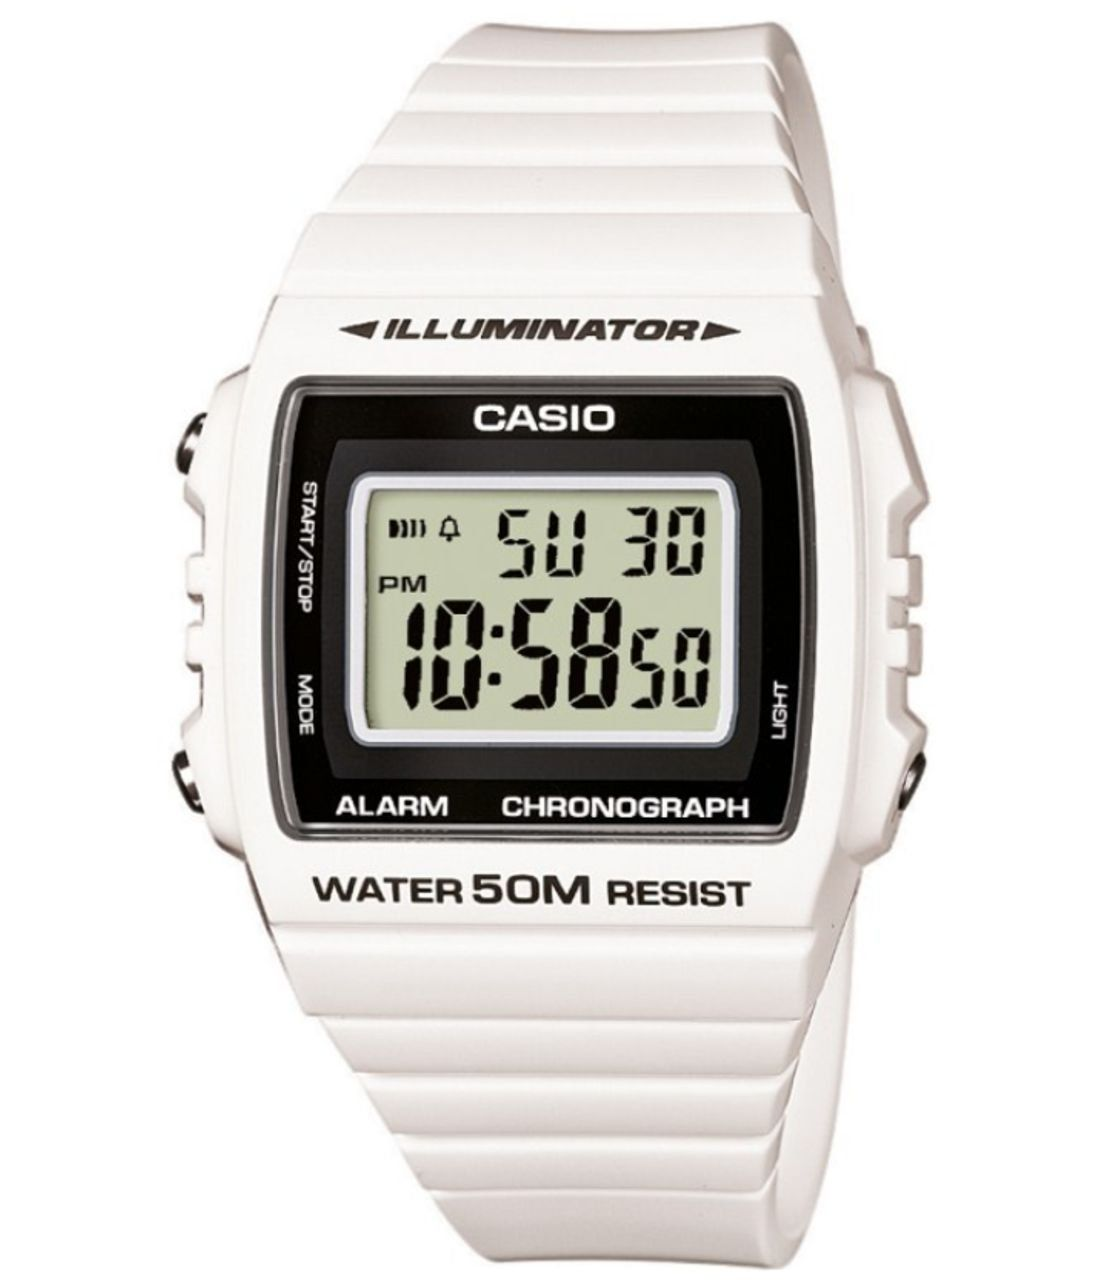 77c481140a90 Casio W-215H-7AVEF - Reloj digital de cuarzo unisex con correa de resina